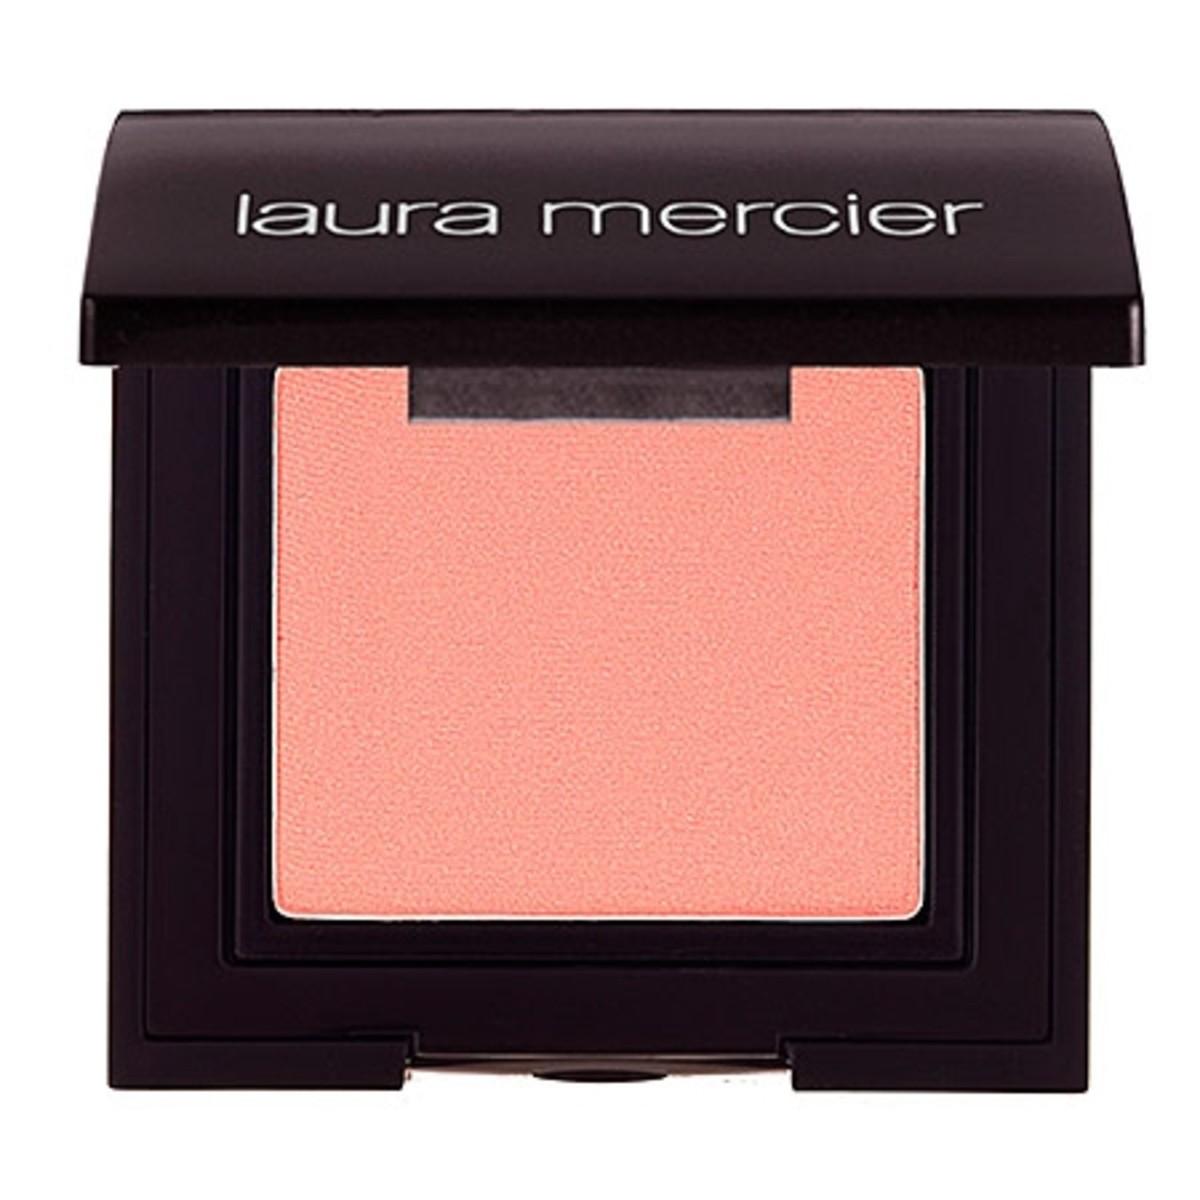 Laura Mercier Second Skin Cheek Colour in Rose Petal